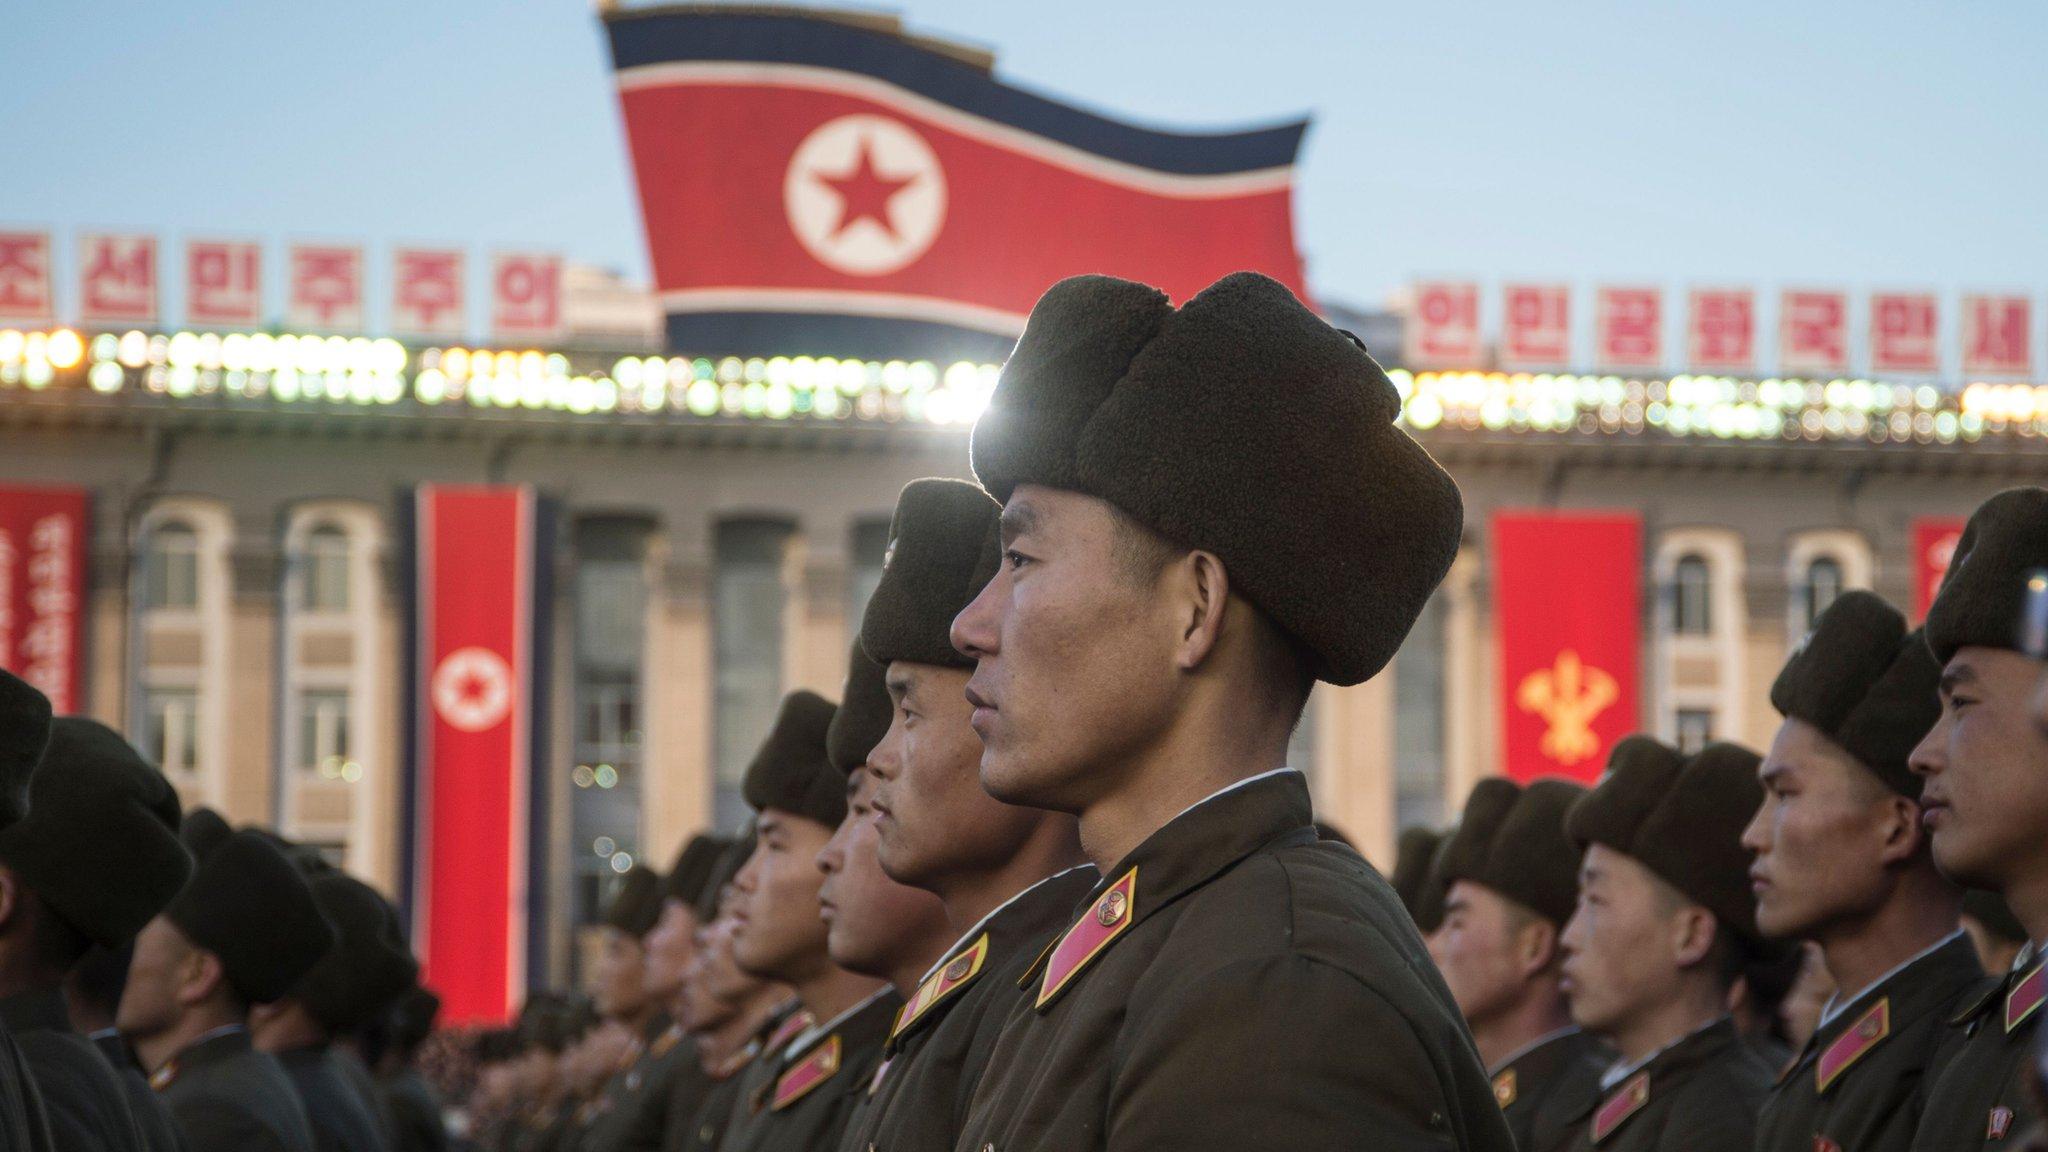 News Daily: Canada blast, Weinstein 'to surrender' and N Korea latest